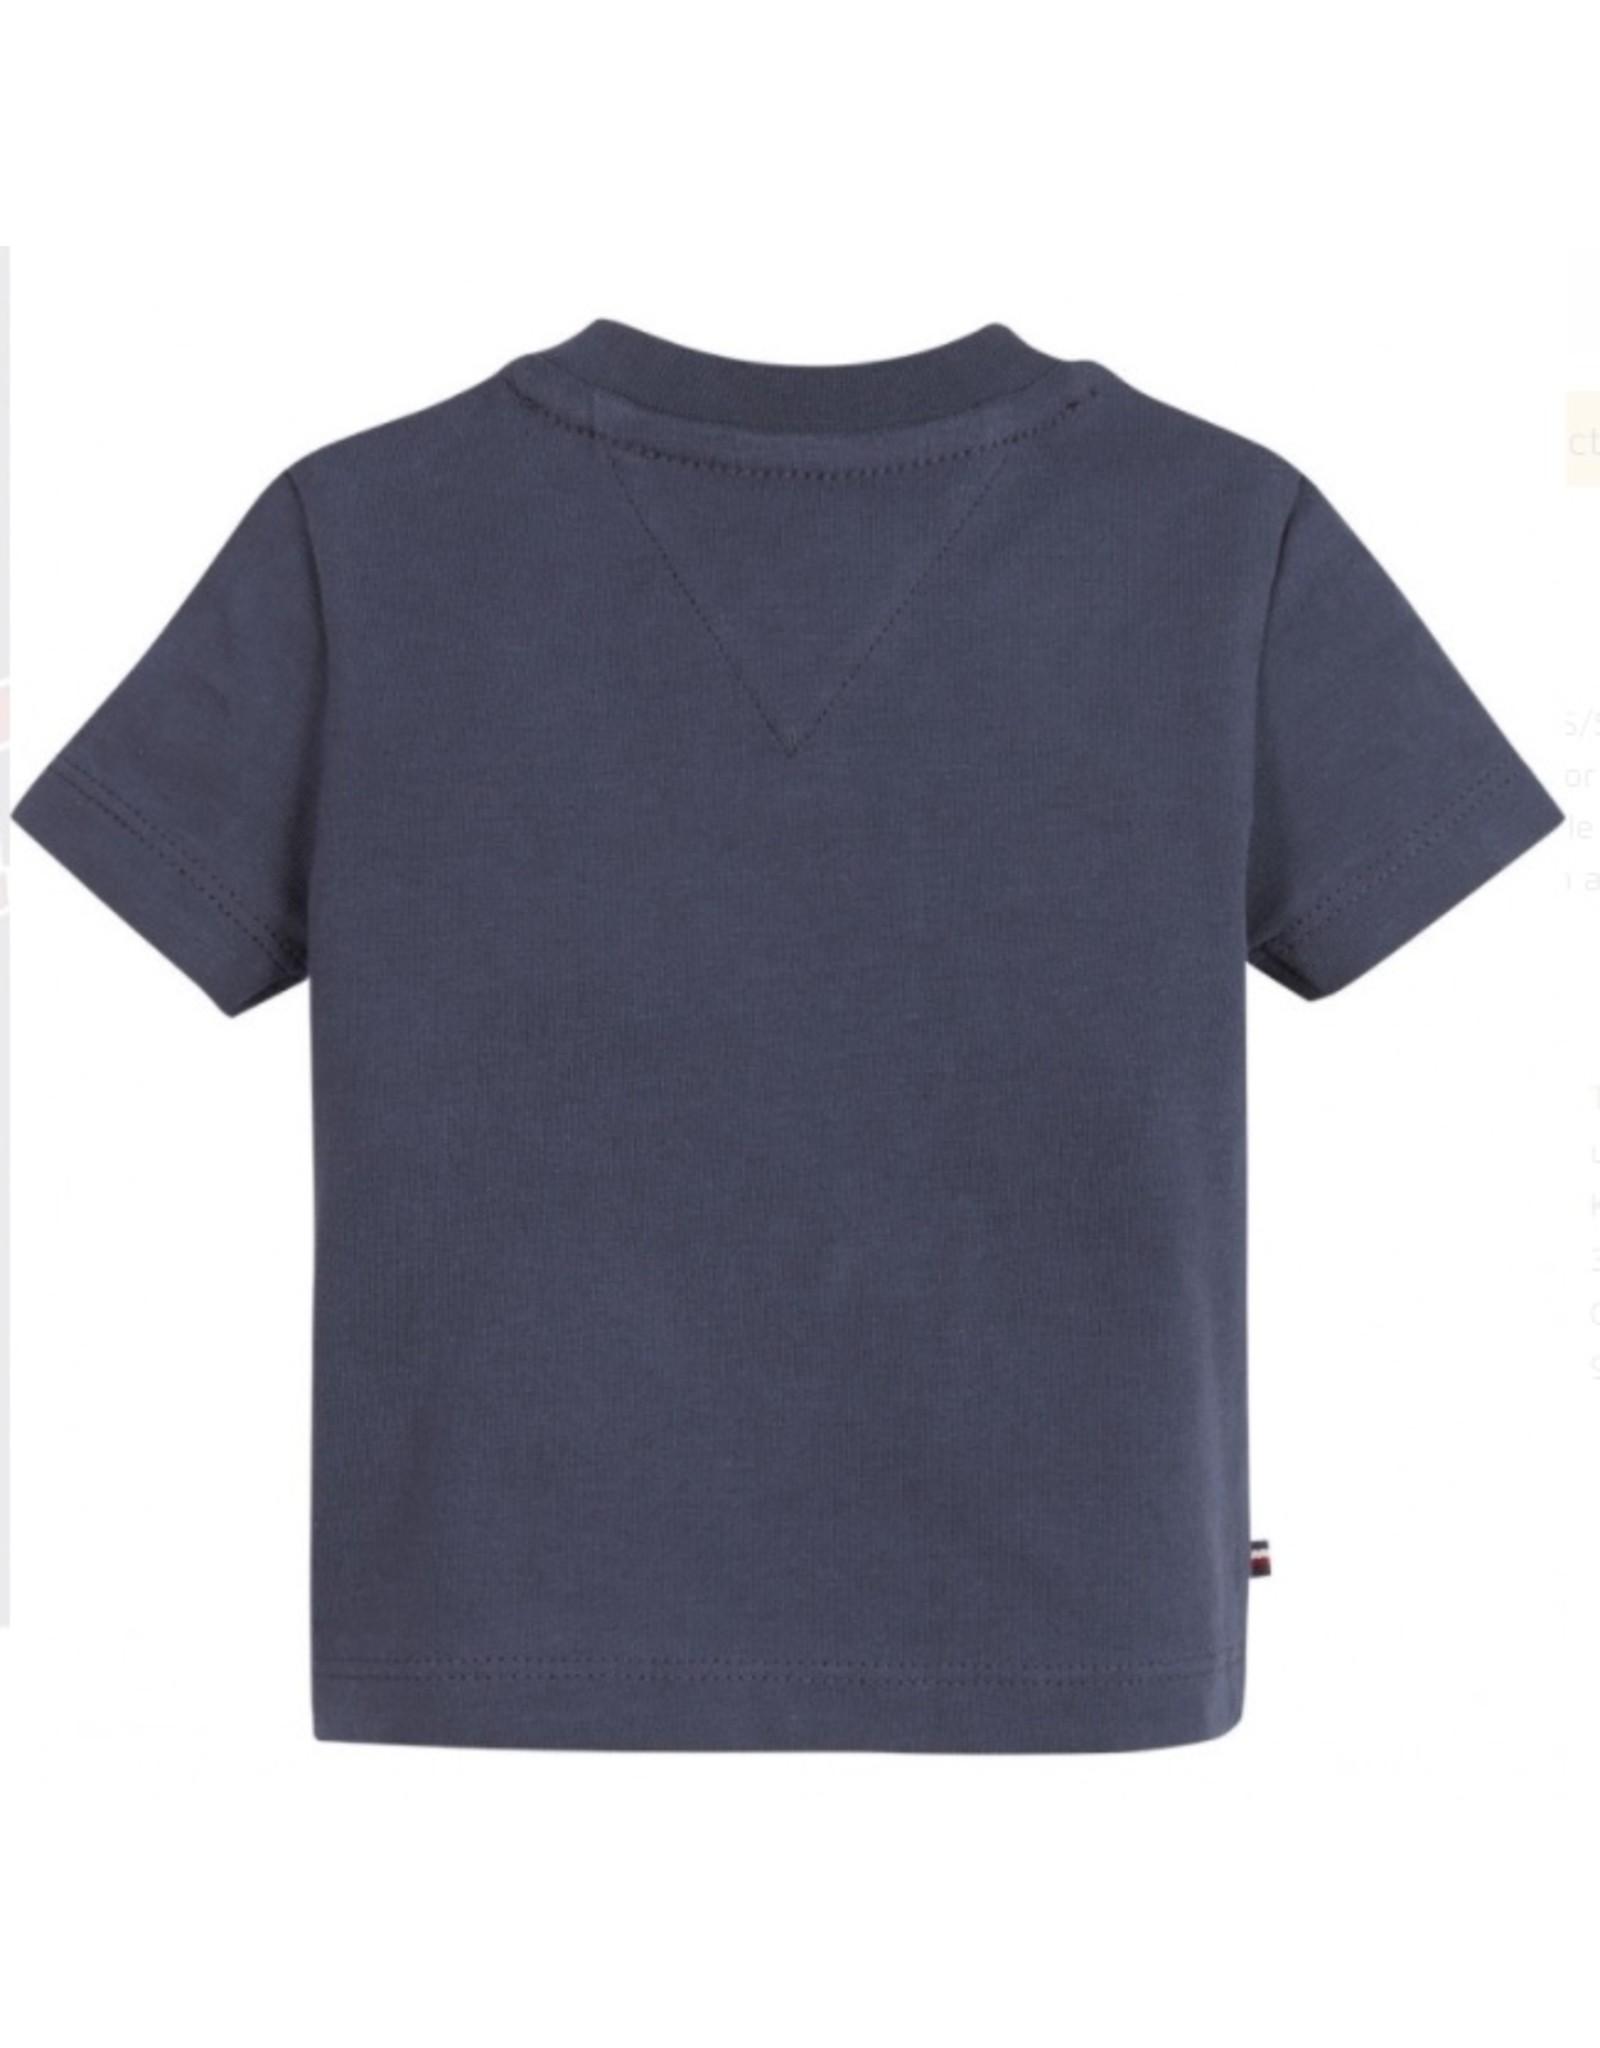 Tommy Hilfiger 1272 T-Shirt